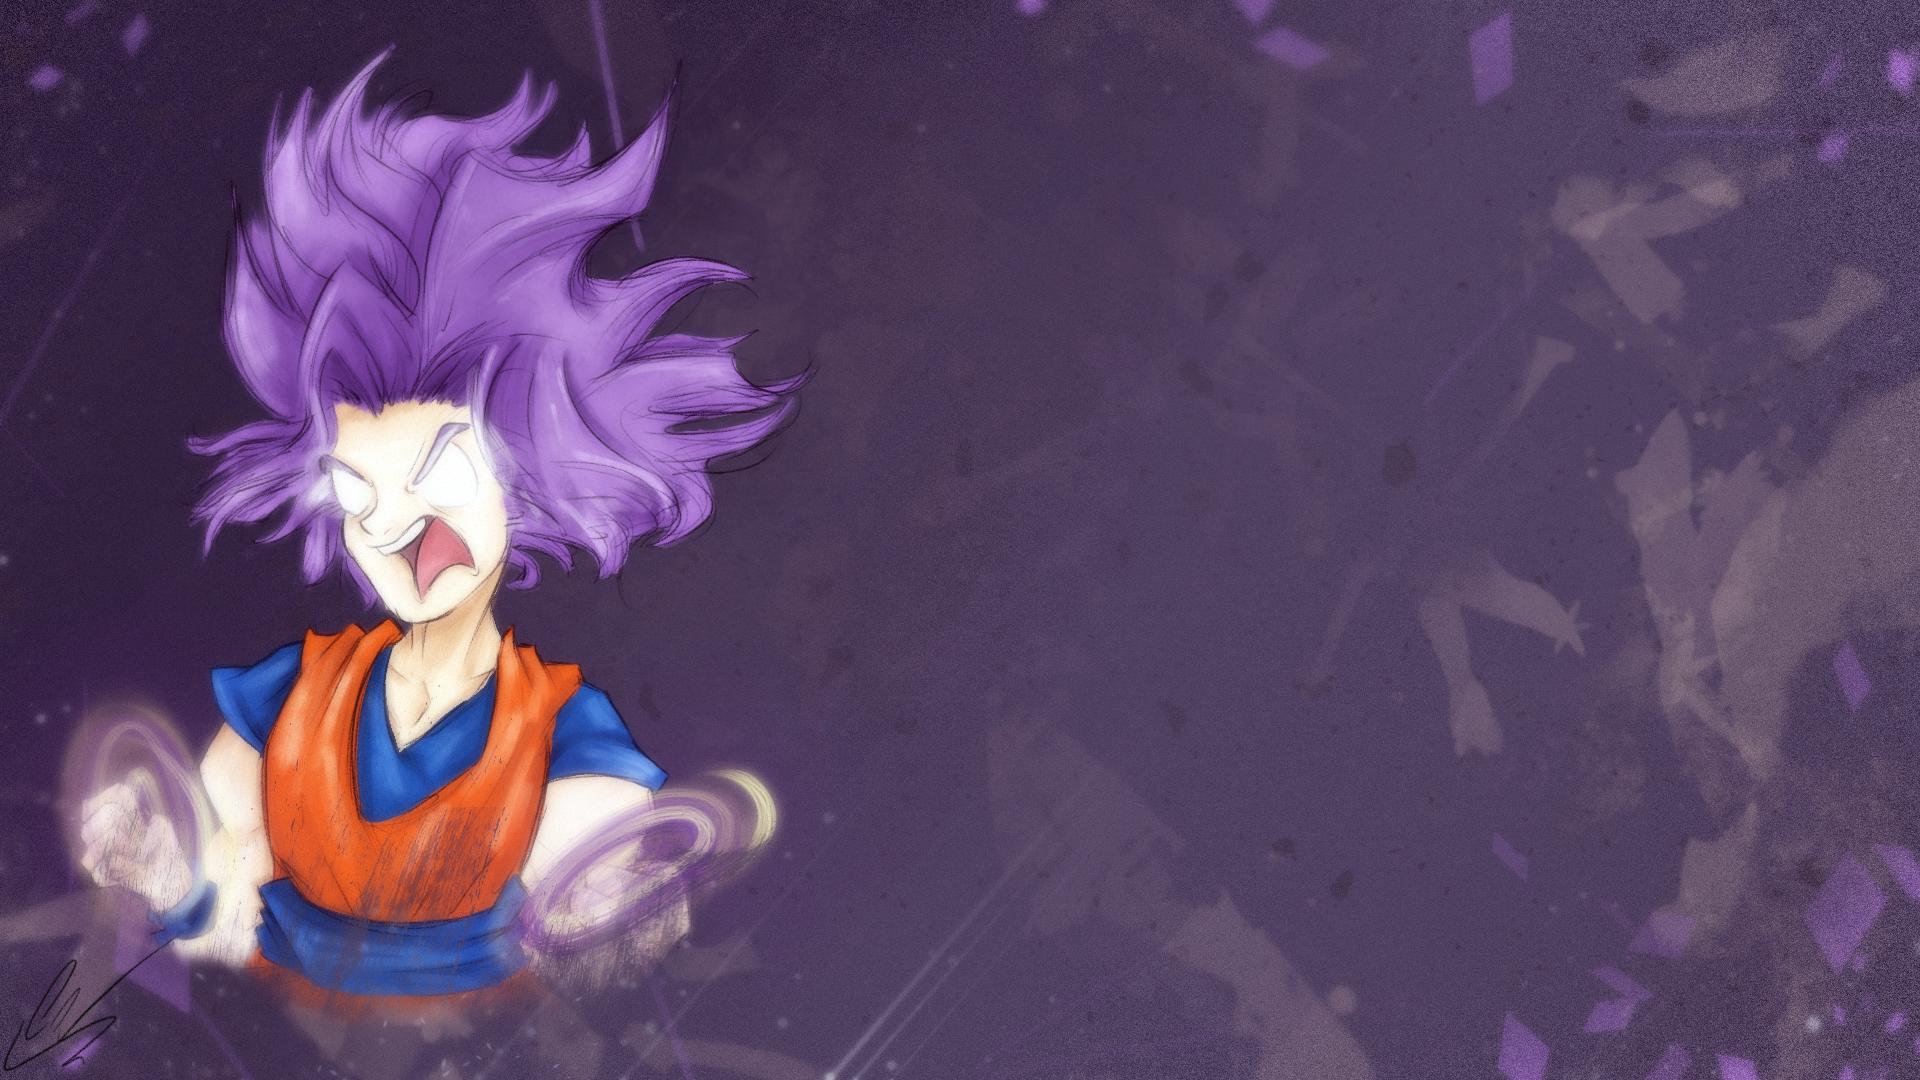 LVL99 Goku